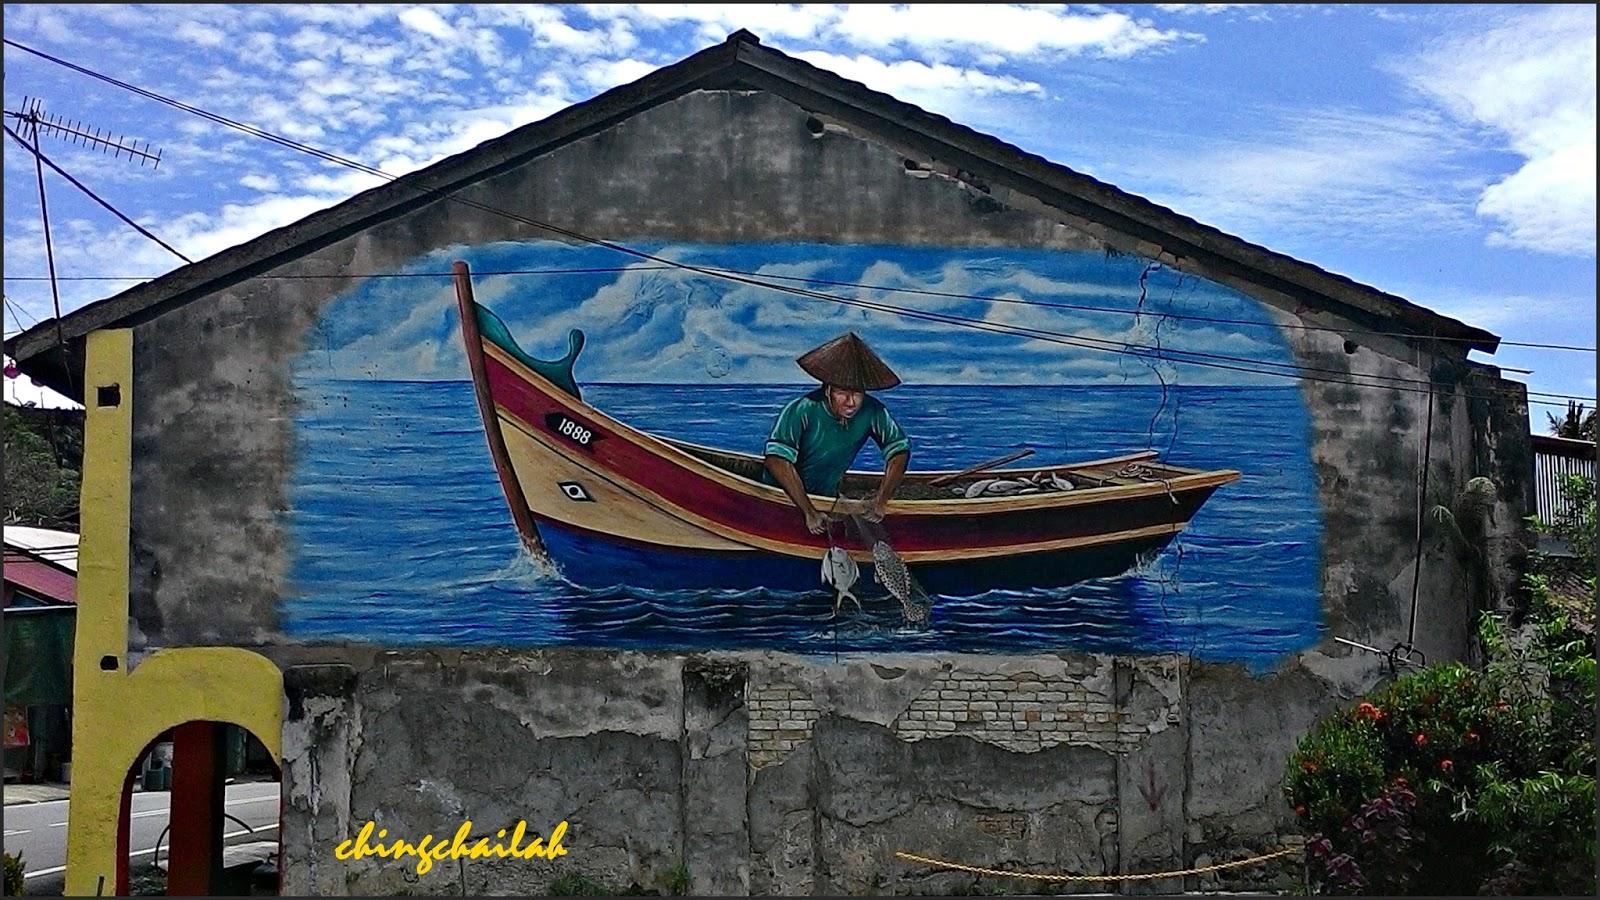 Simple Living In Nancy Wall Murals Old Treasures From Simpang